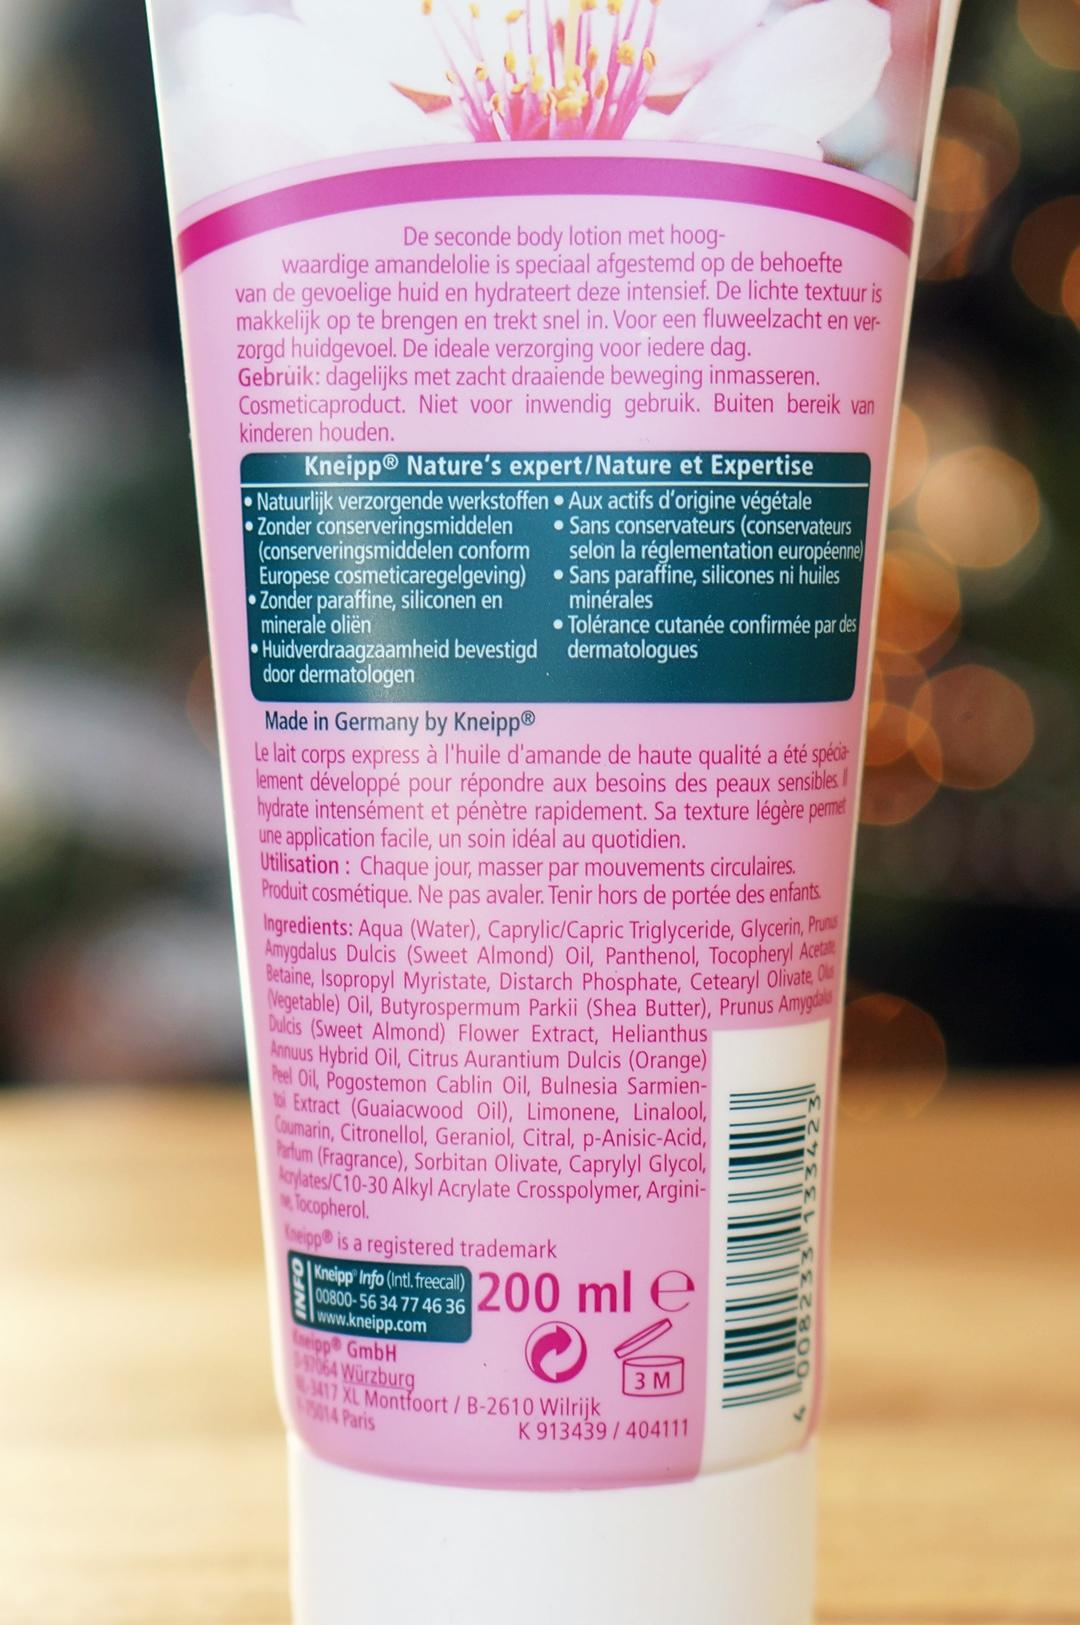 Kneipp Amandelbloesem douche foam & seconde body lotion